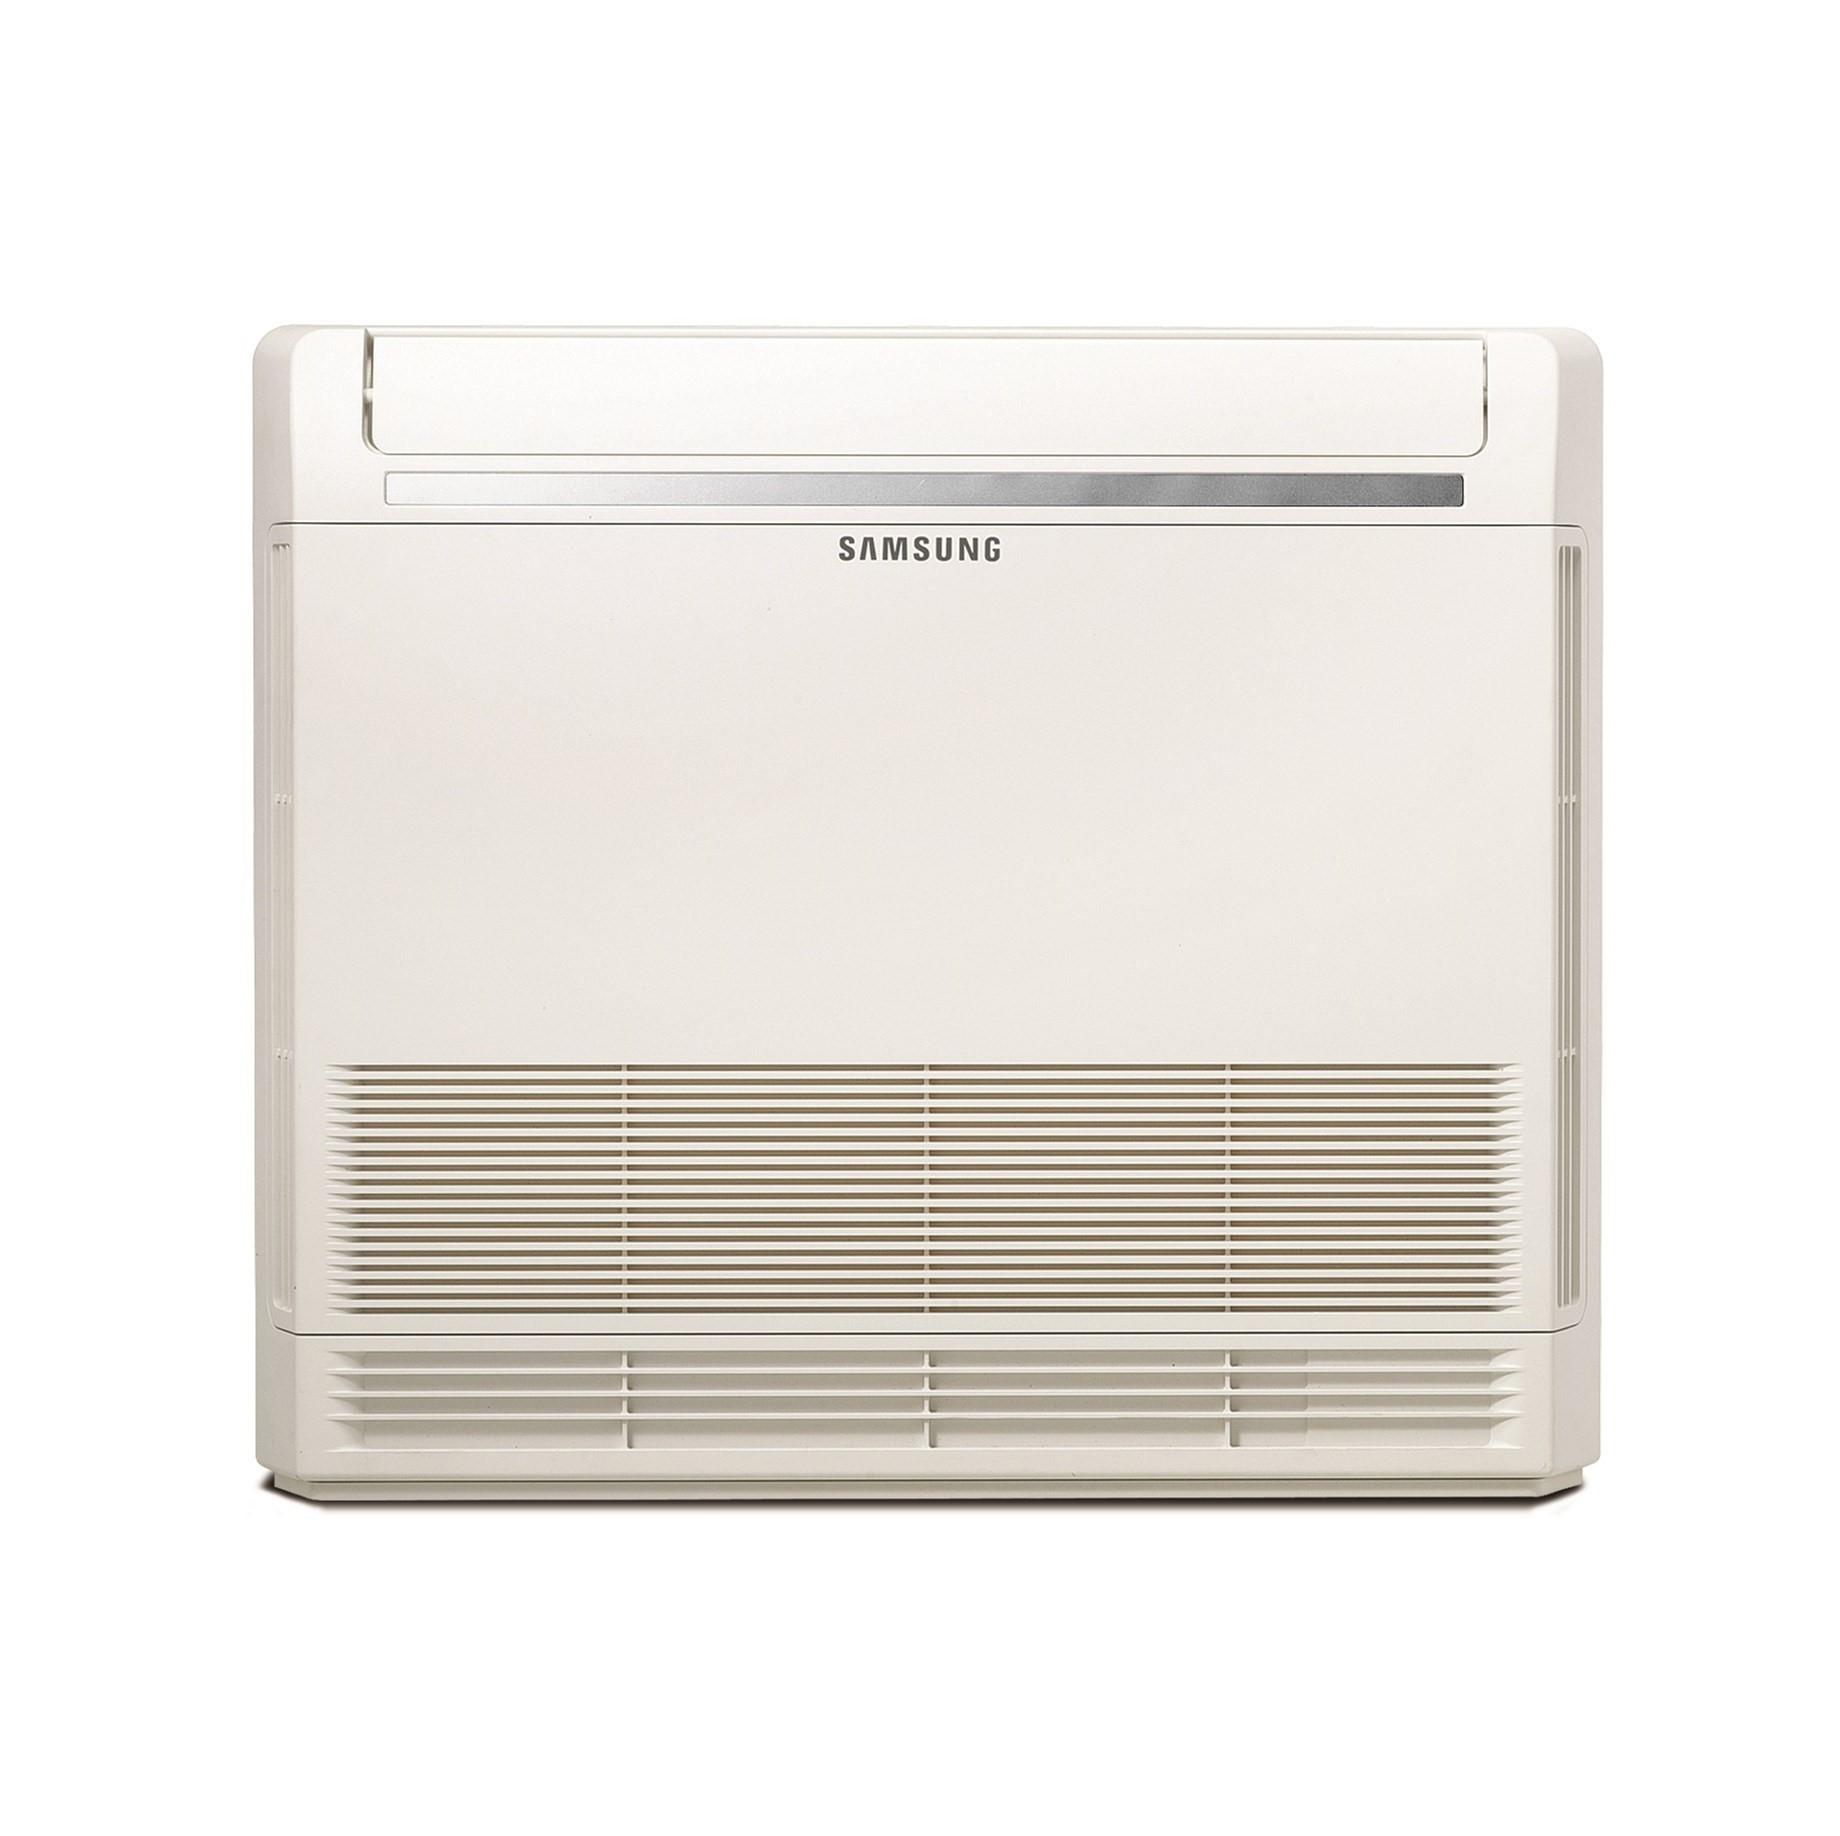 Parapetní klimatizace Samsung AC026MNJDKHEU + AC026MXADKHEU